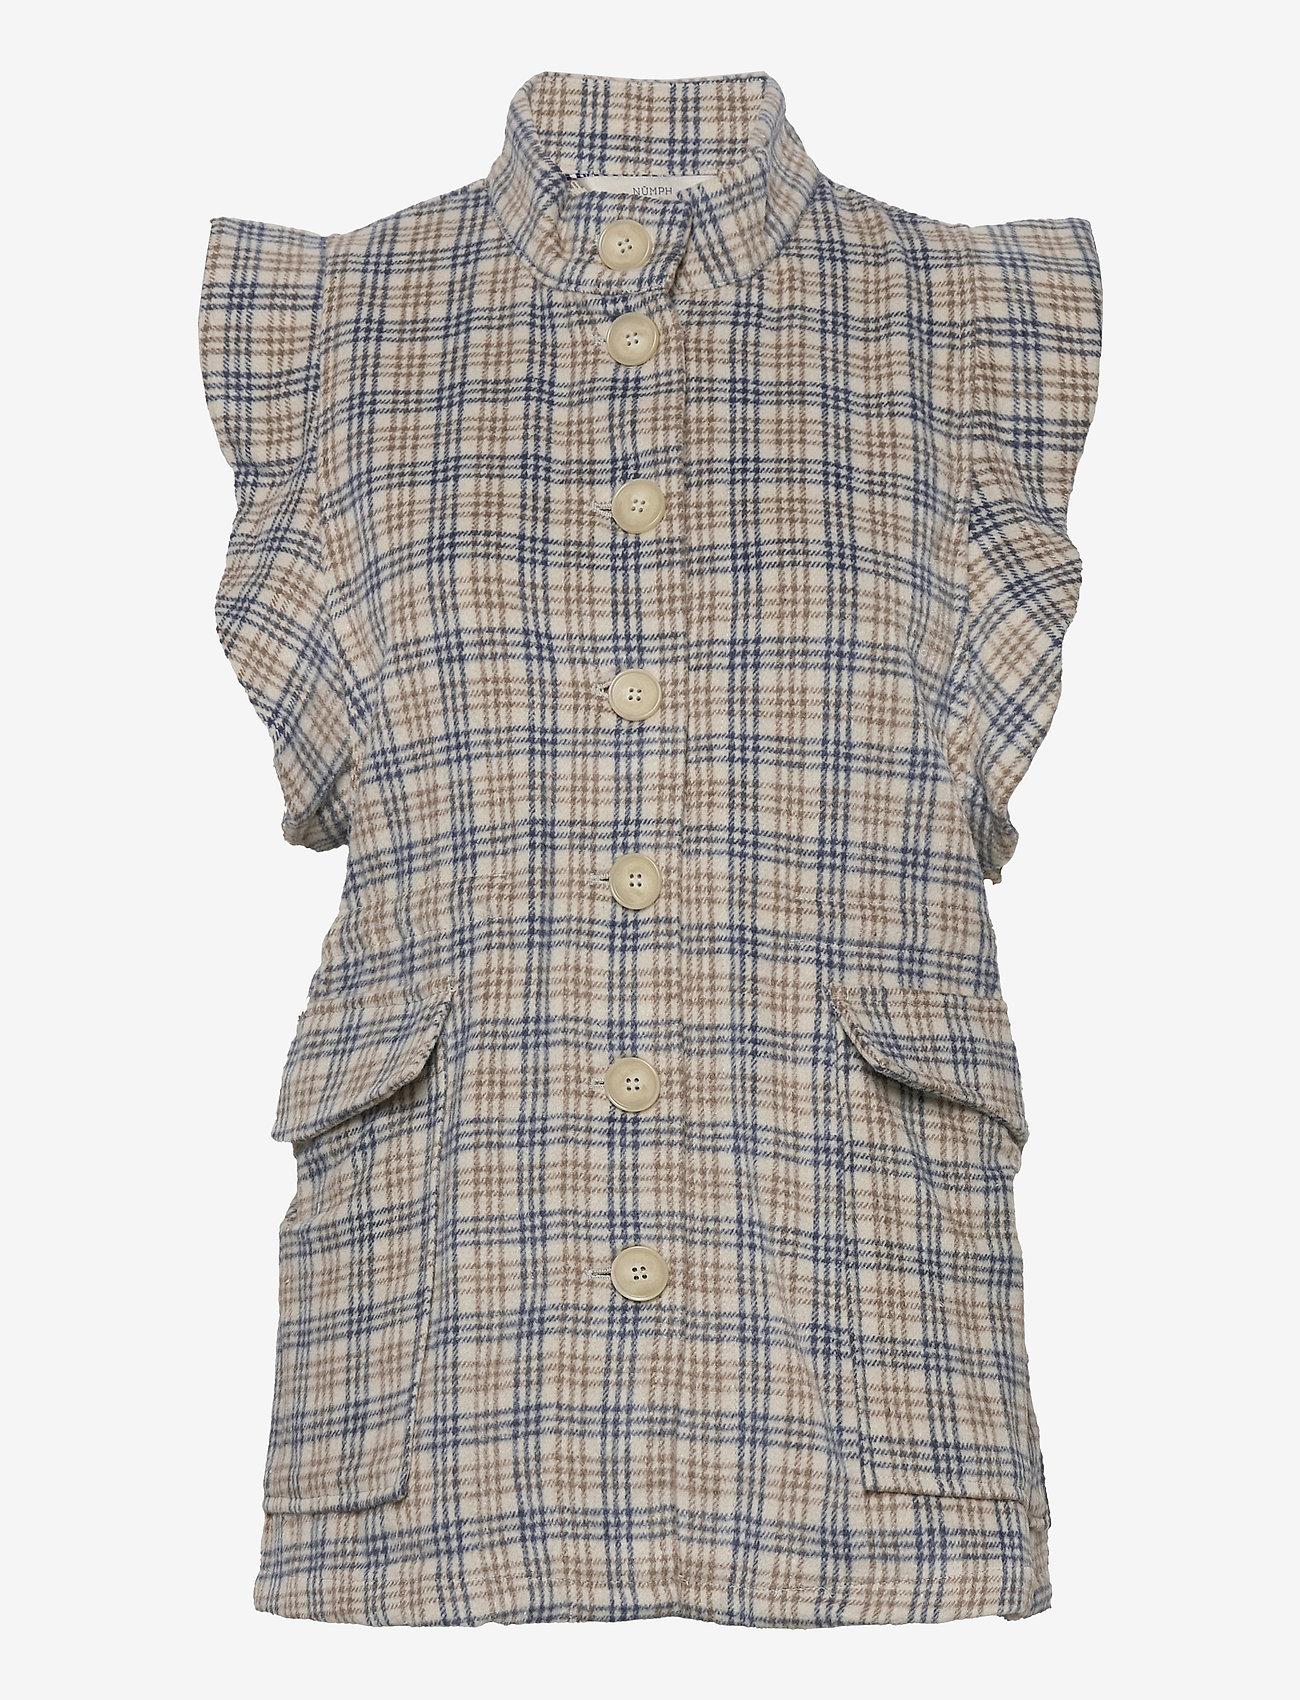 Nümph - NUALMA VEST - knitted vests - wedgewood - 1